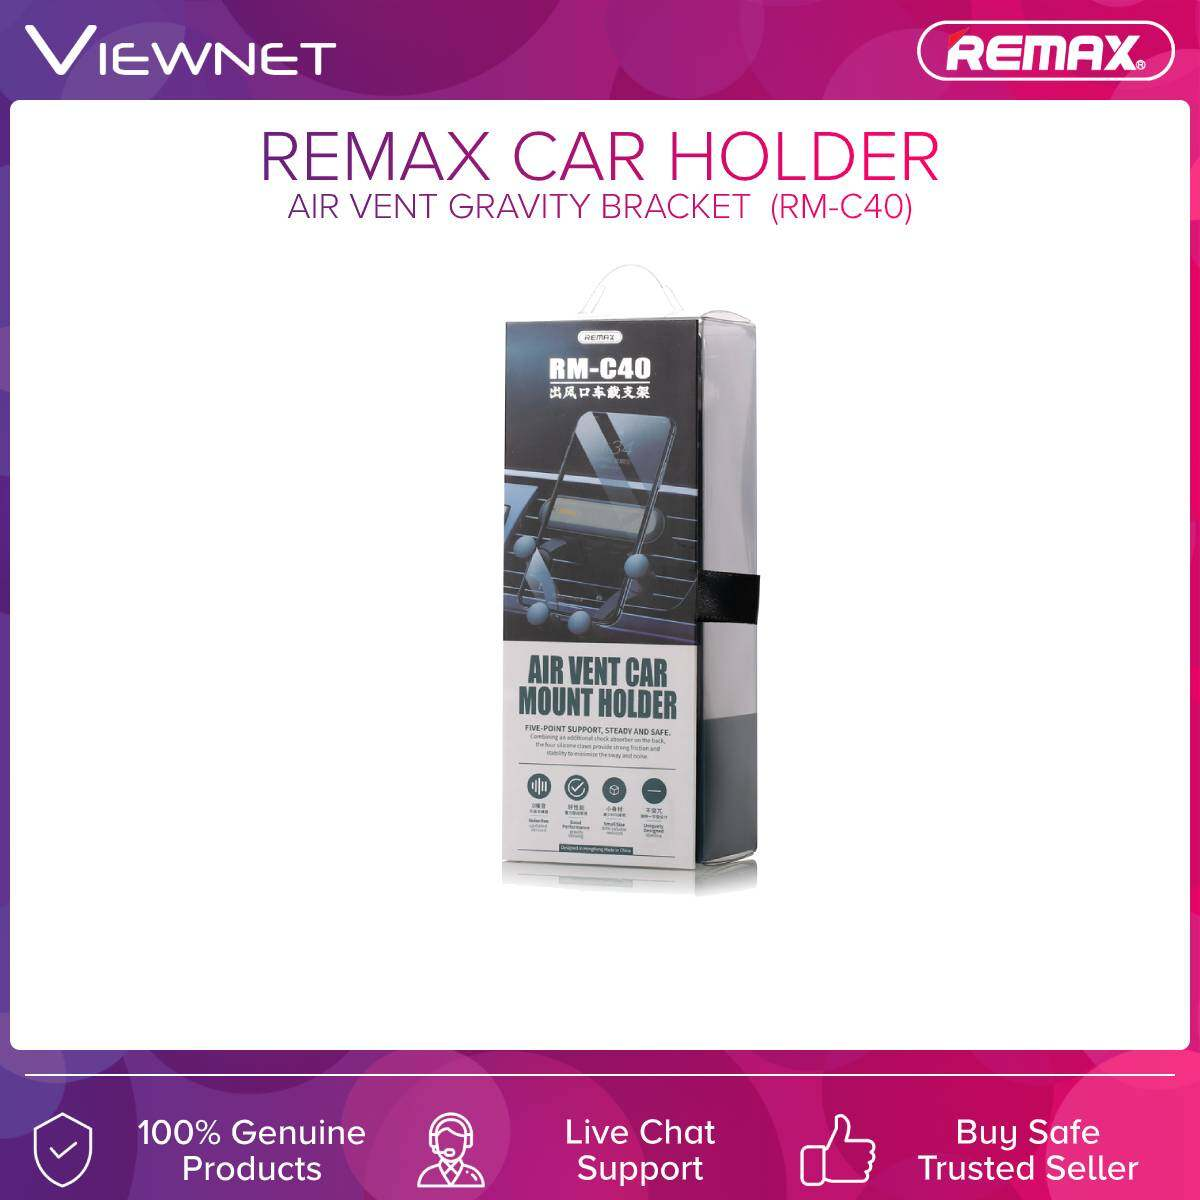 Remax (RM-C40) Car Holder Air Vents Gravity Bracket